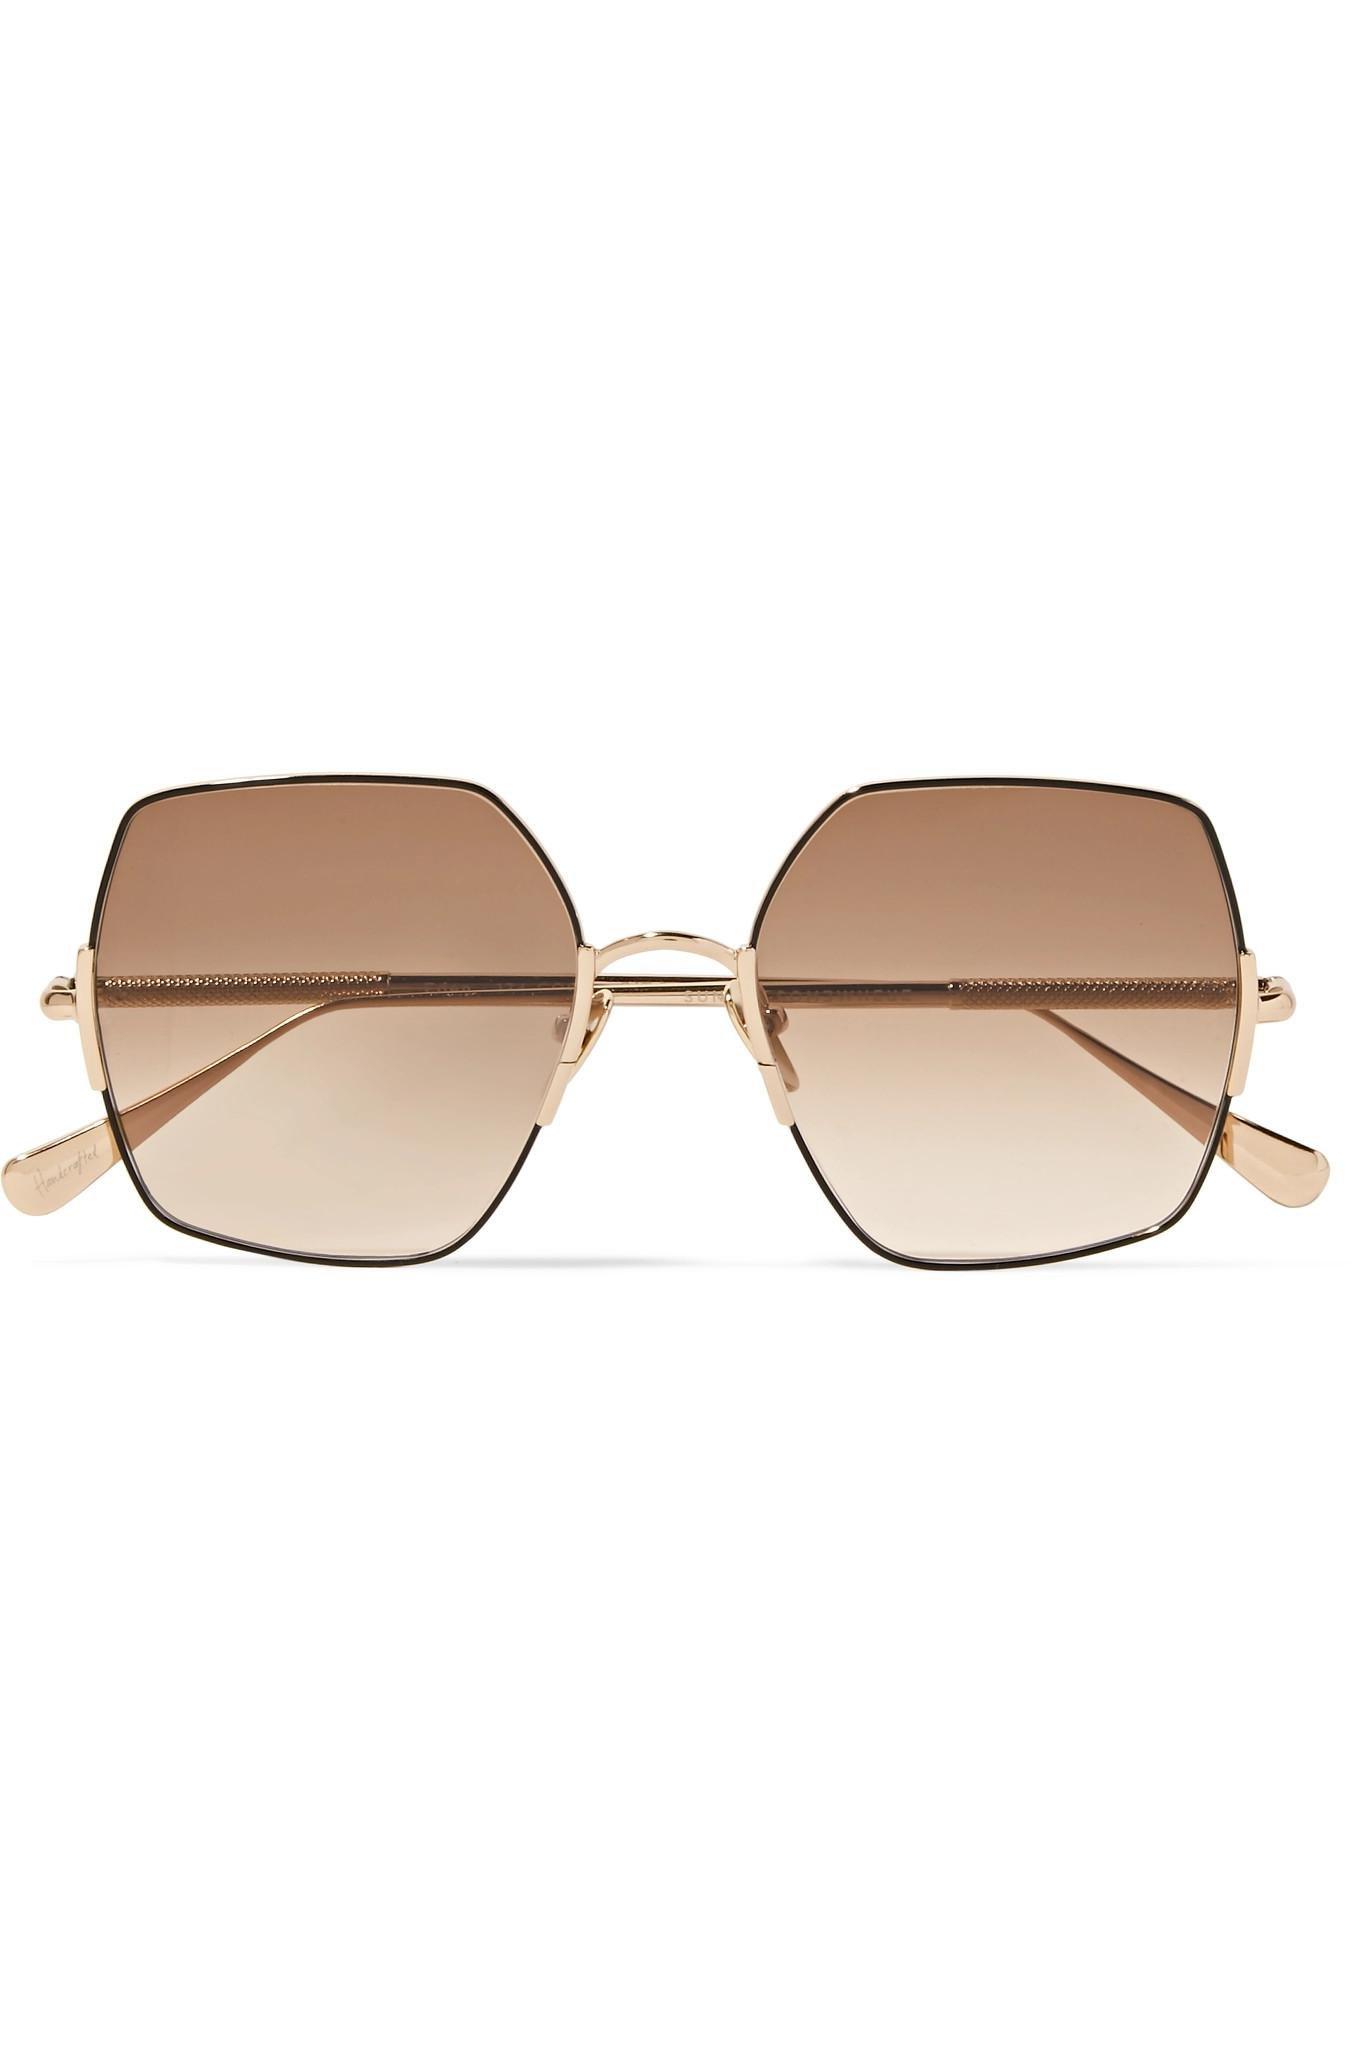 1a858a7305e3e Sunday Somewhere Eden Oversized Square-frame Gold-tone Sunglasses in ...